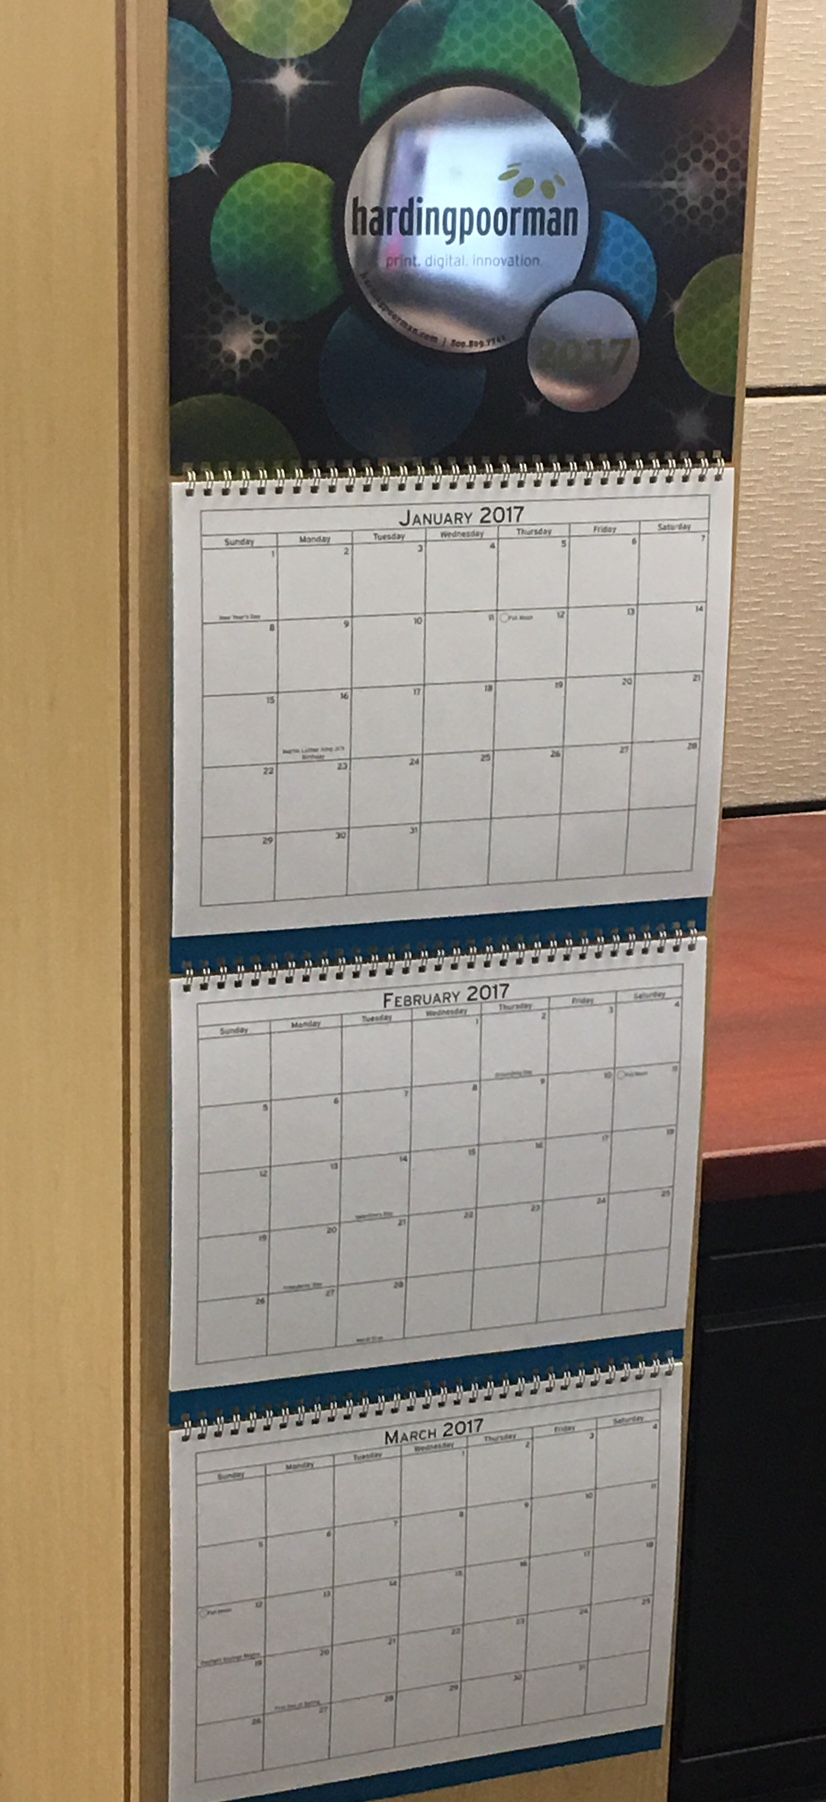 2017 HardingPoorman Calendar printed on Krystal Krome